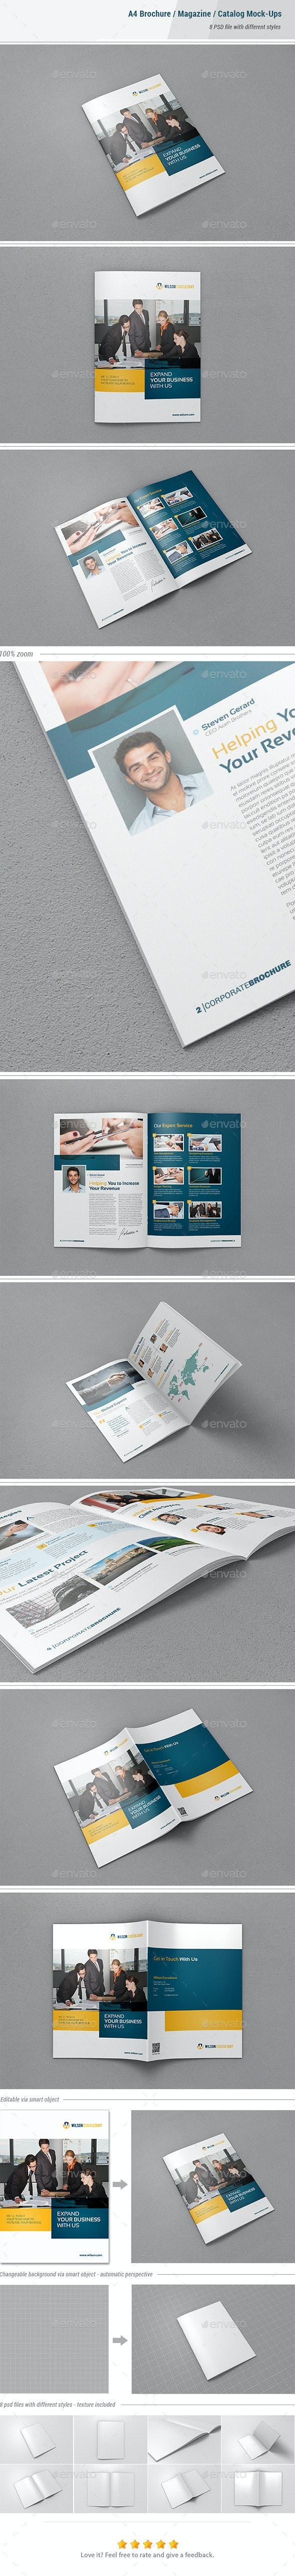 A4 Brochure & Magazine Mock-Ups - Brochures Print